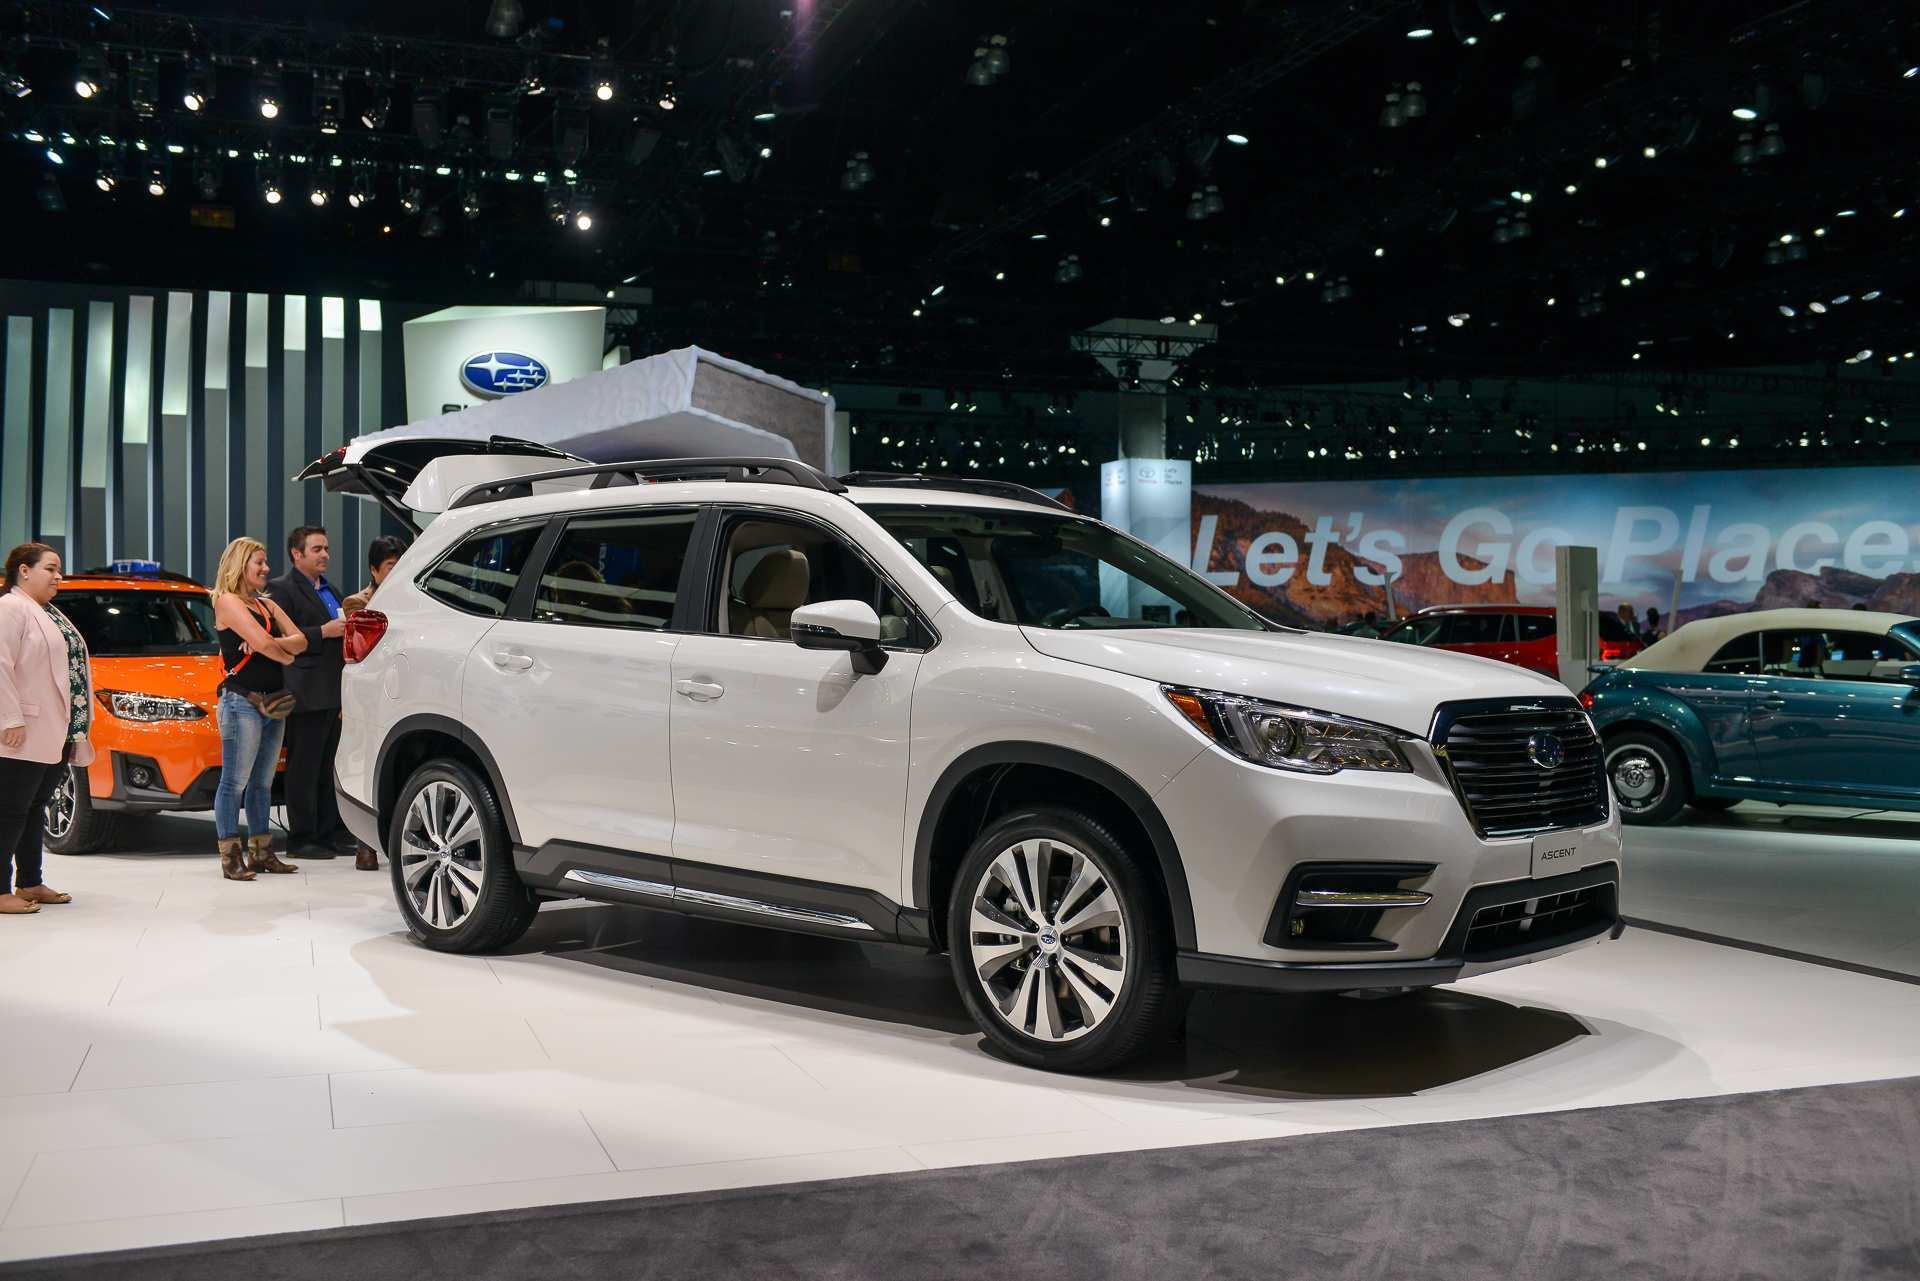 74 Concept of 2019 Subaru Ascent Fuel Economy Images with 2019 Subaru Ascent Fuel Economy